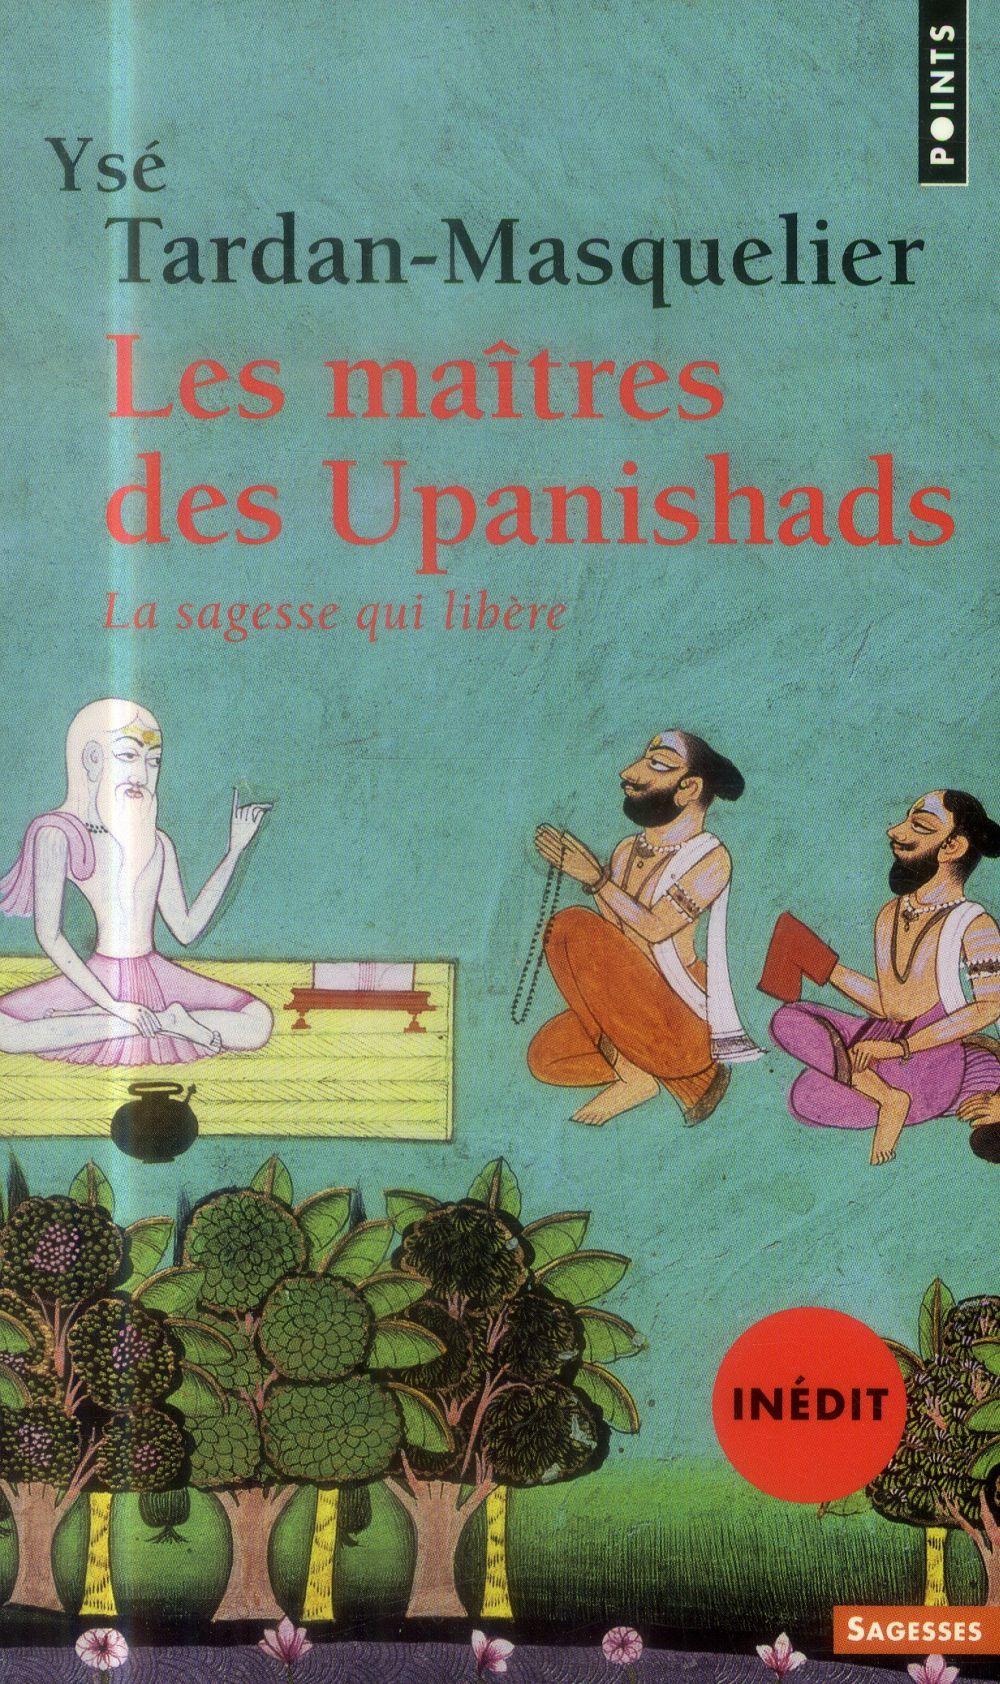 LES MAITRES DES UPANISHADS (IN TARDAN-MASQUELIER YS Points